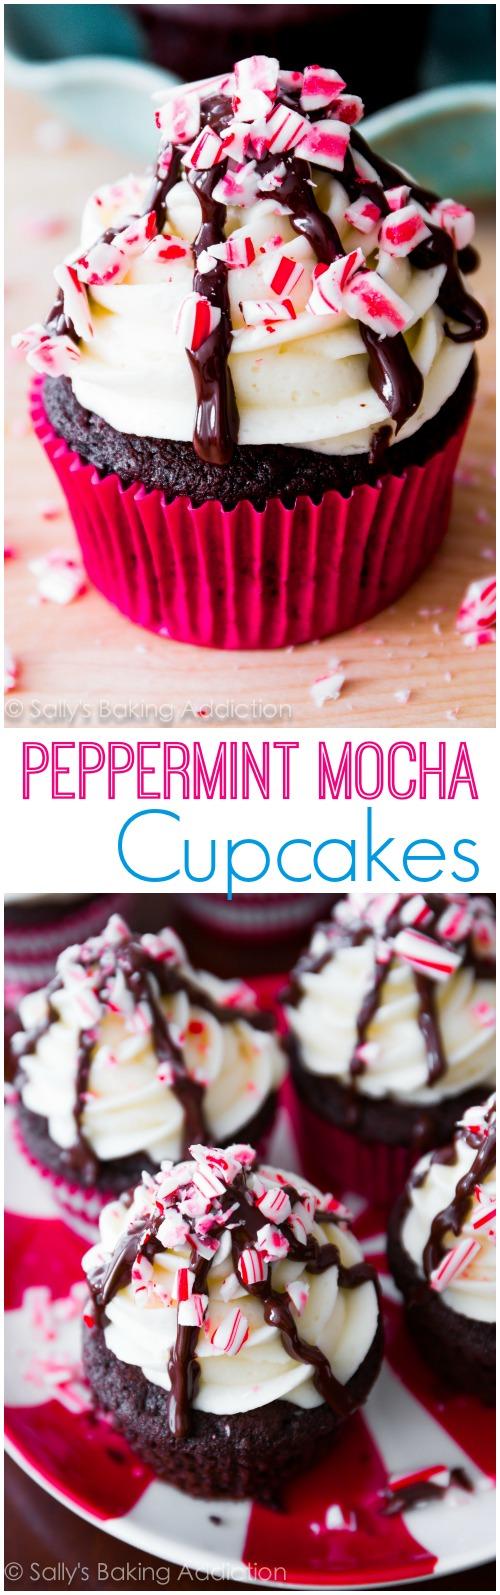 Peppermint Mocha Christmas Cupcakes